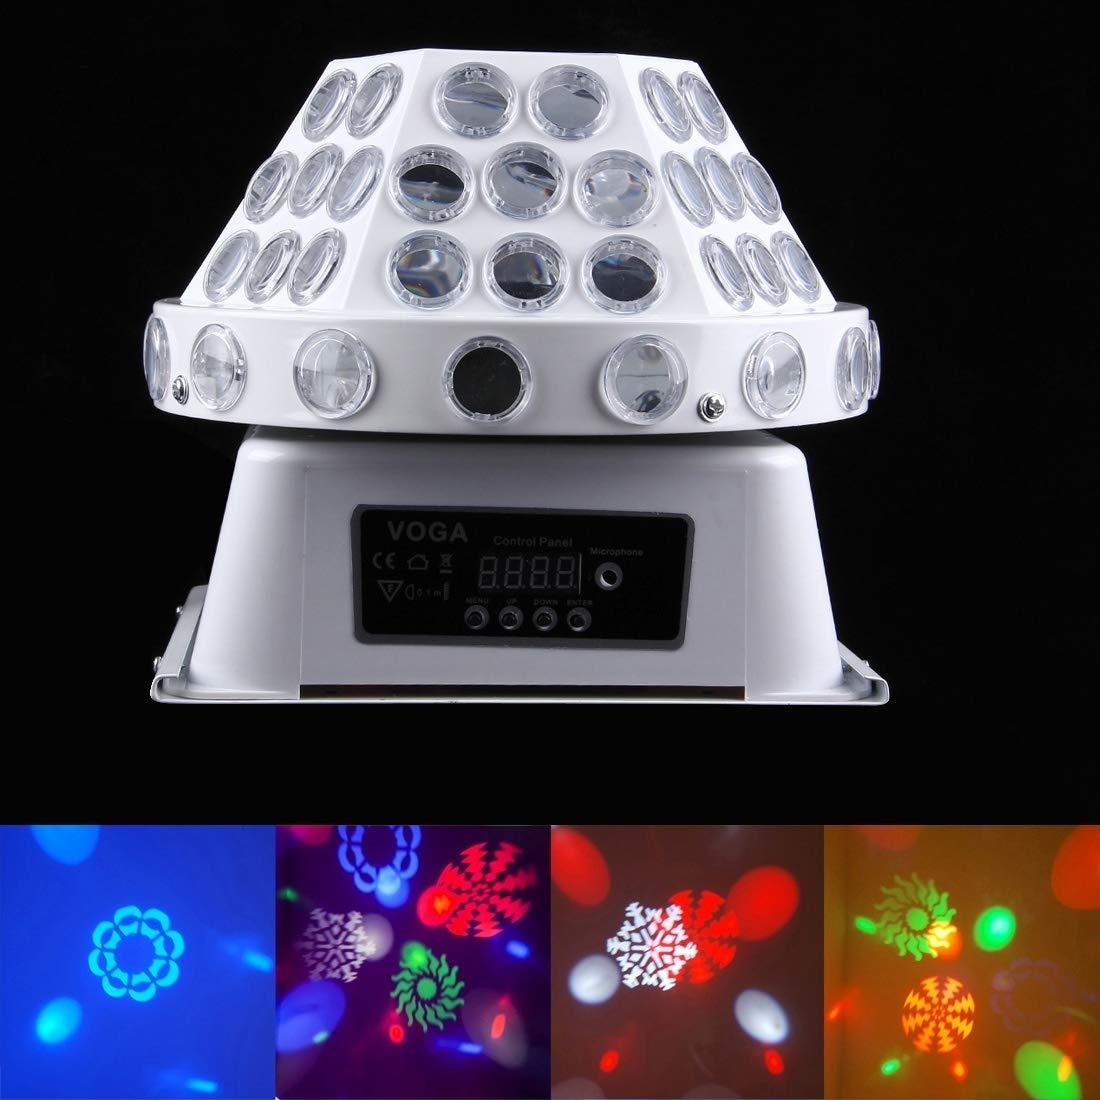 stage lighting 30W Mushroom Magic Ball LED Crystal Light, Master/Slave / DMX512 / Auto Run/Sound Control Modes, AC 220V by stage lighting (Image #1)